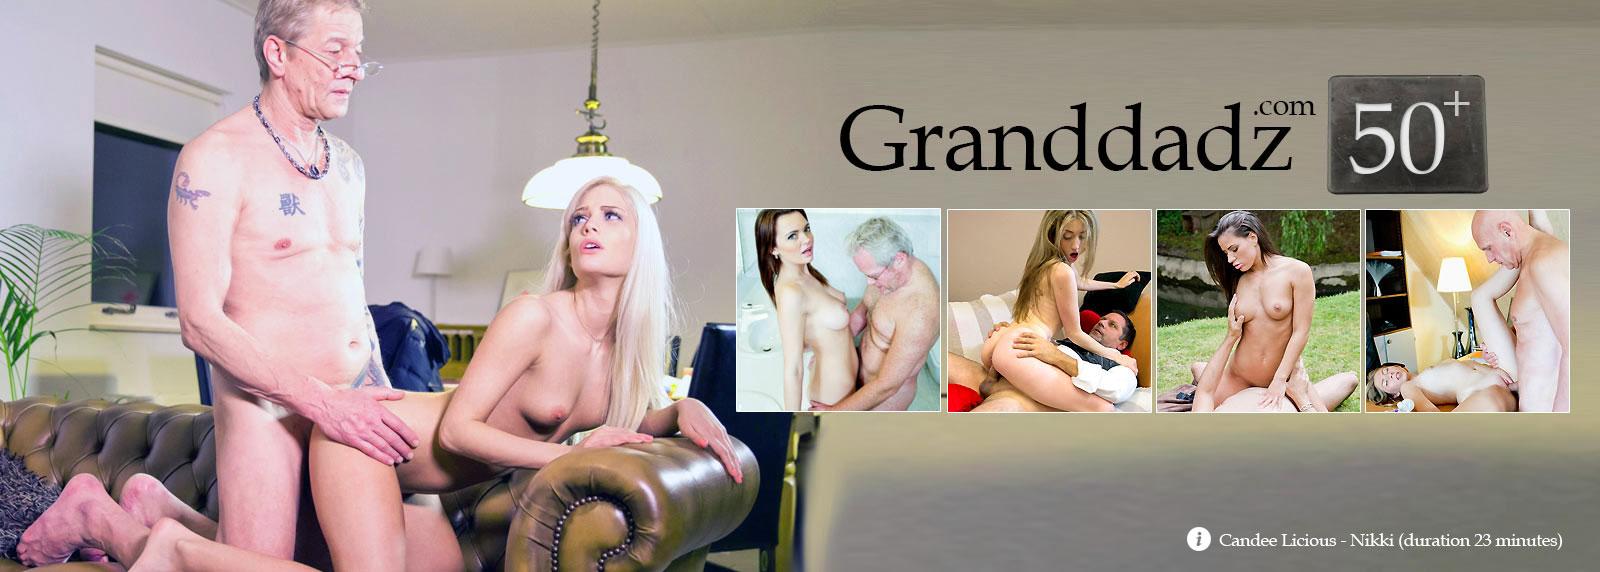 granddad fucking young girl